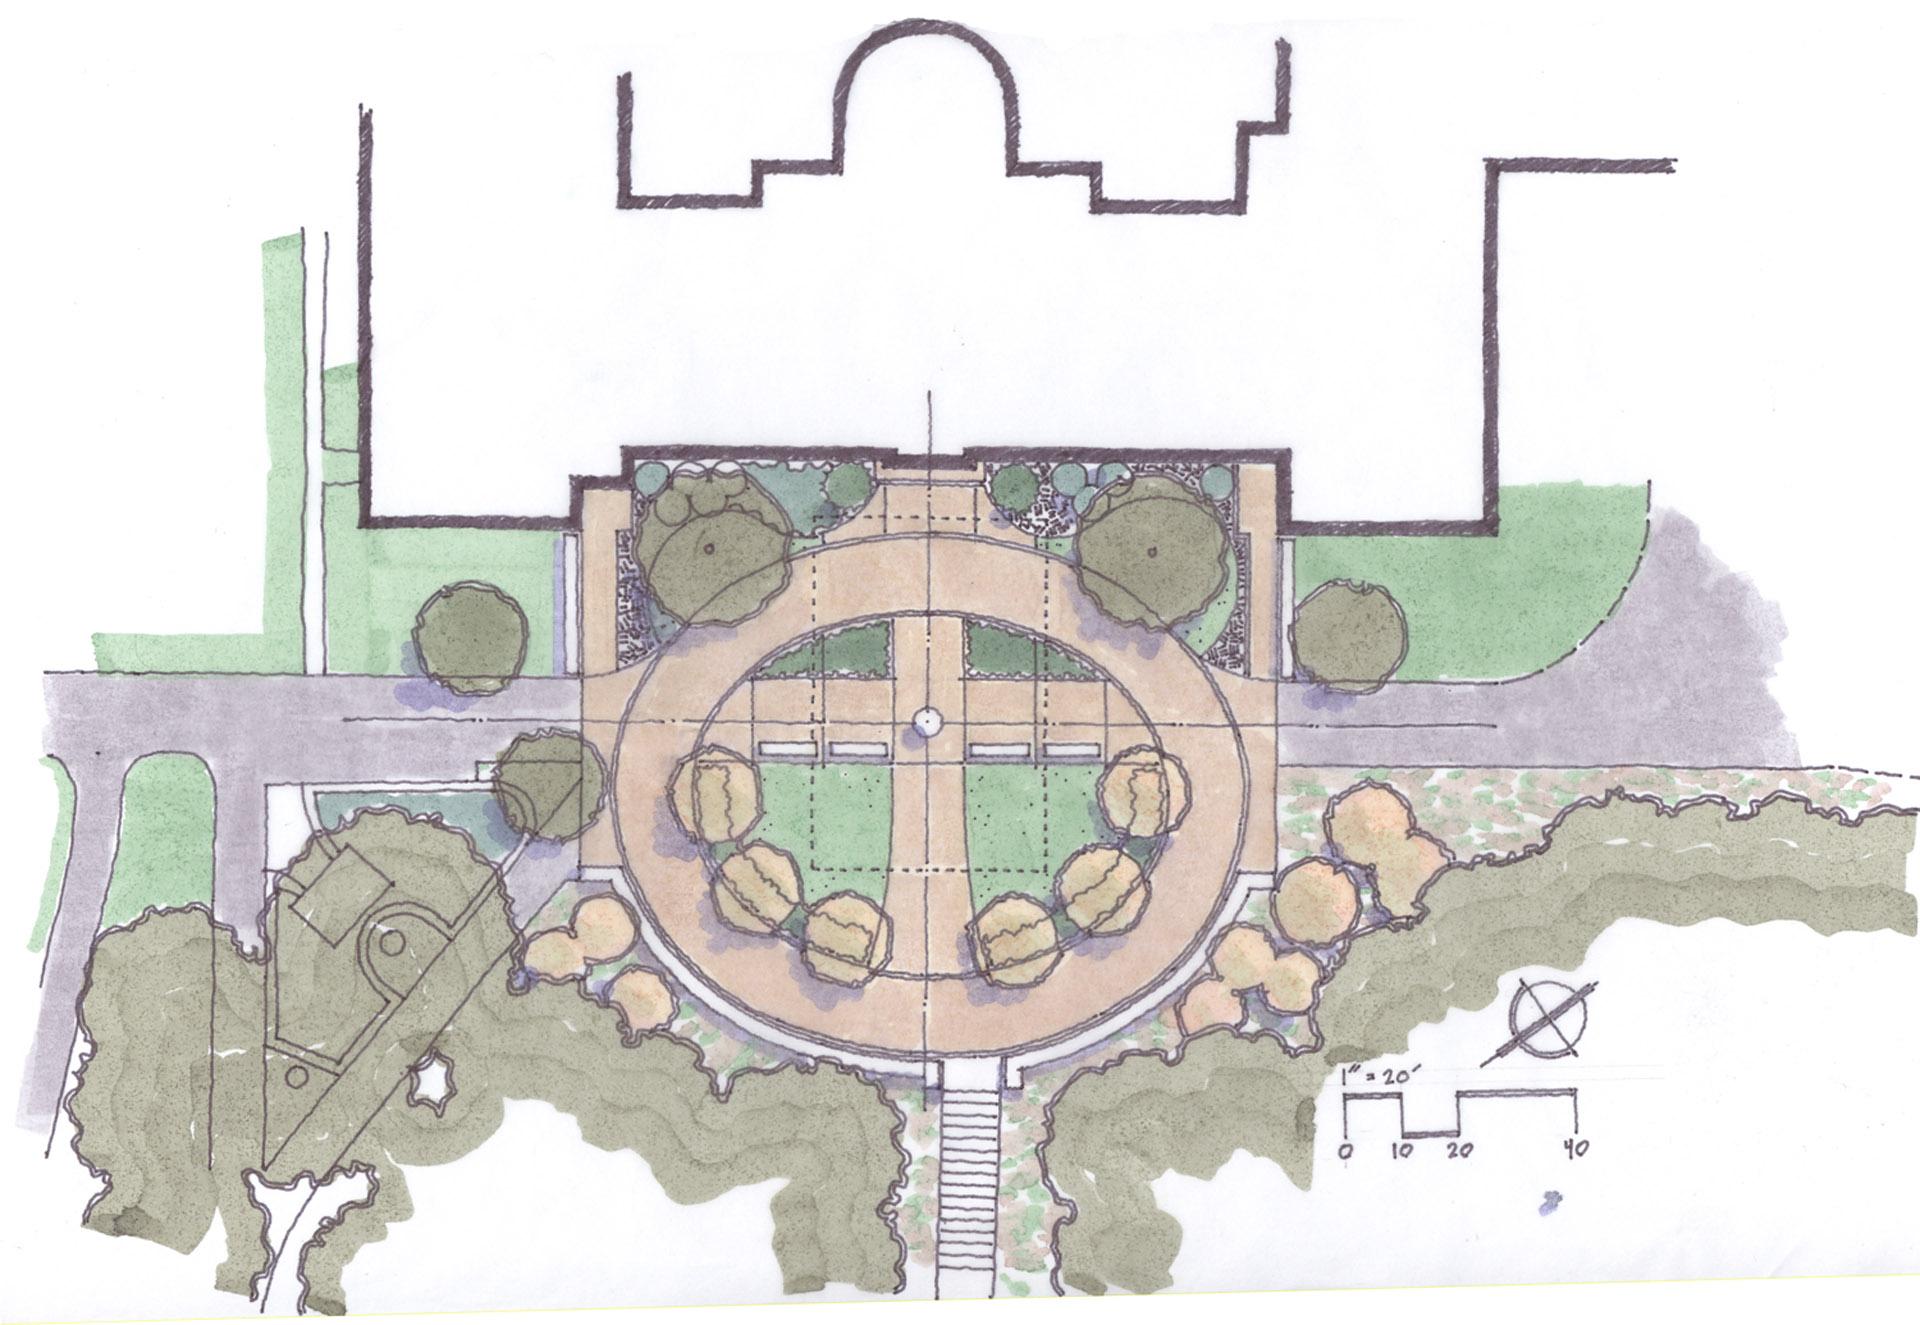 Penn State University Abington Campus Option B Plan